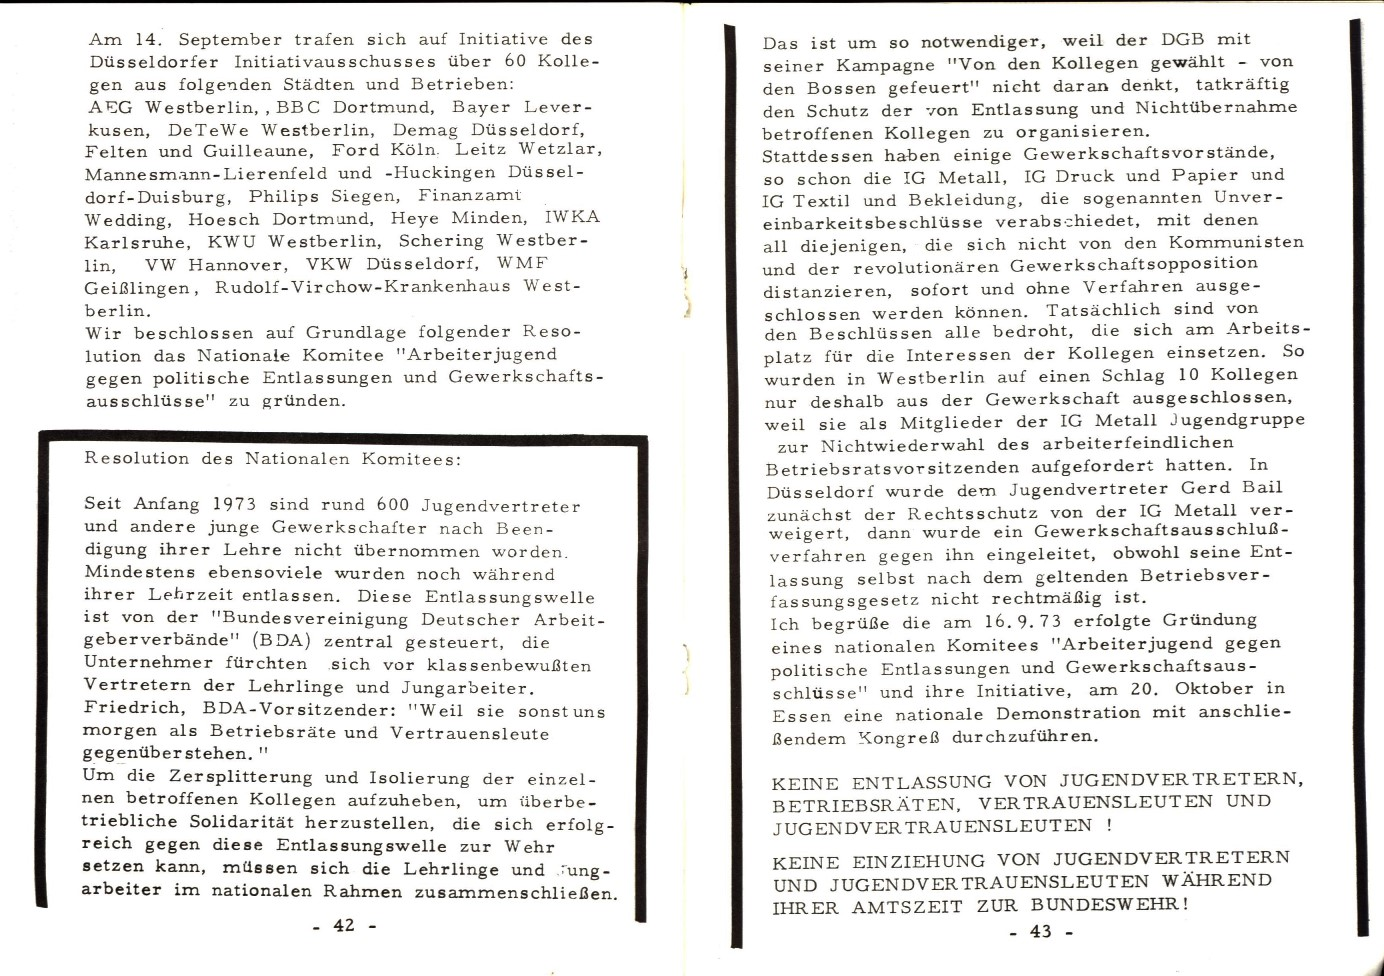 KJV_1973_NK_Arbeiterjugend_23